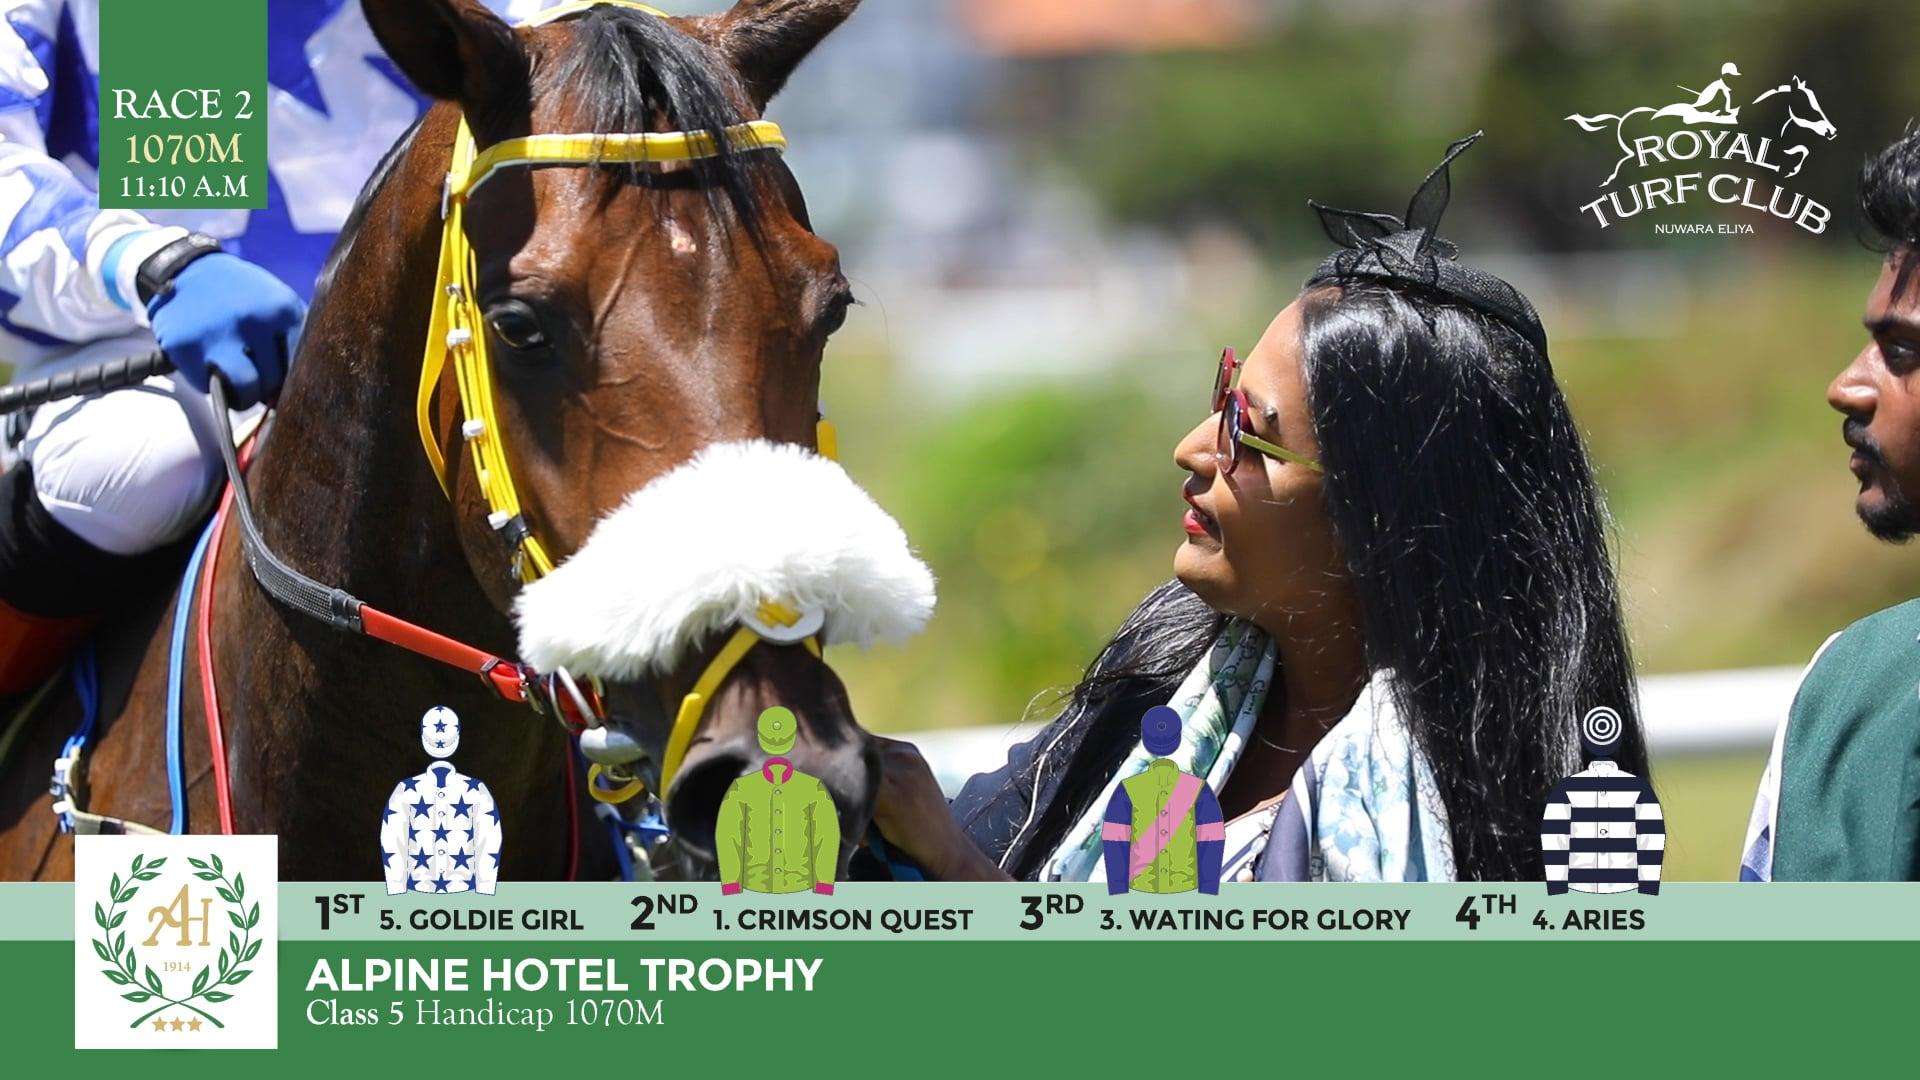 Alpine hotel trophy 2020